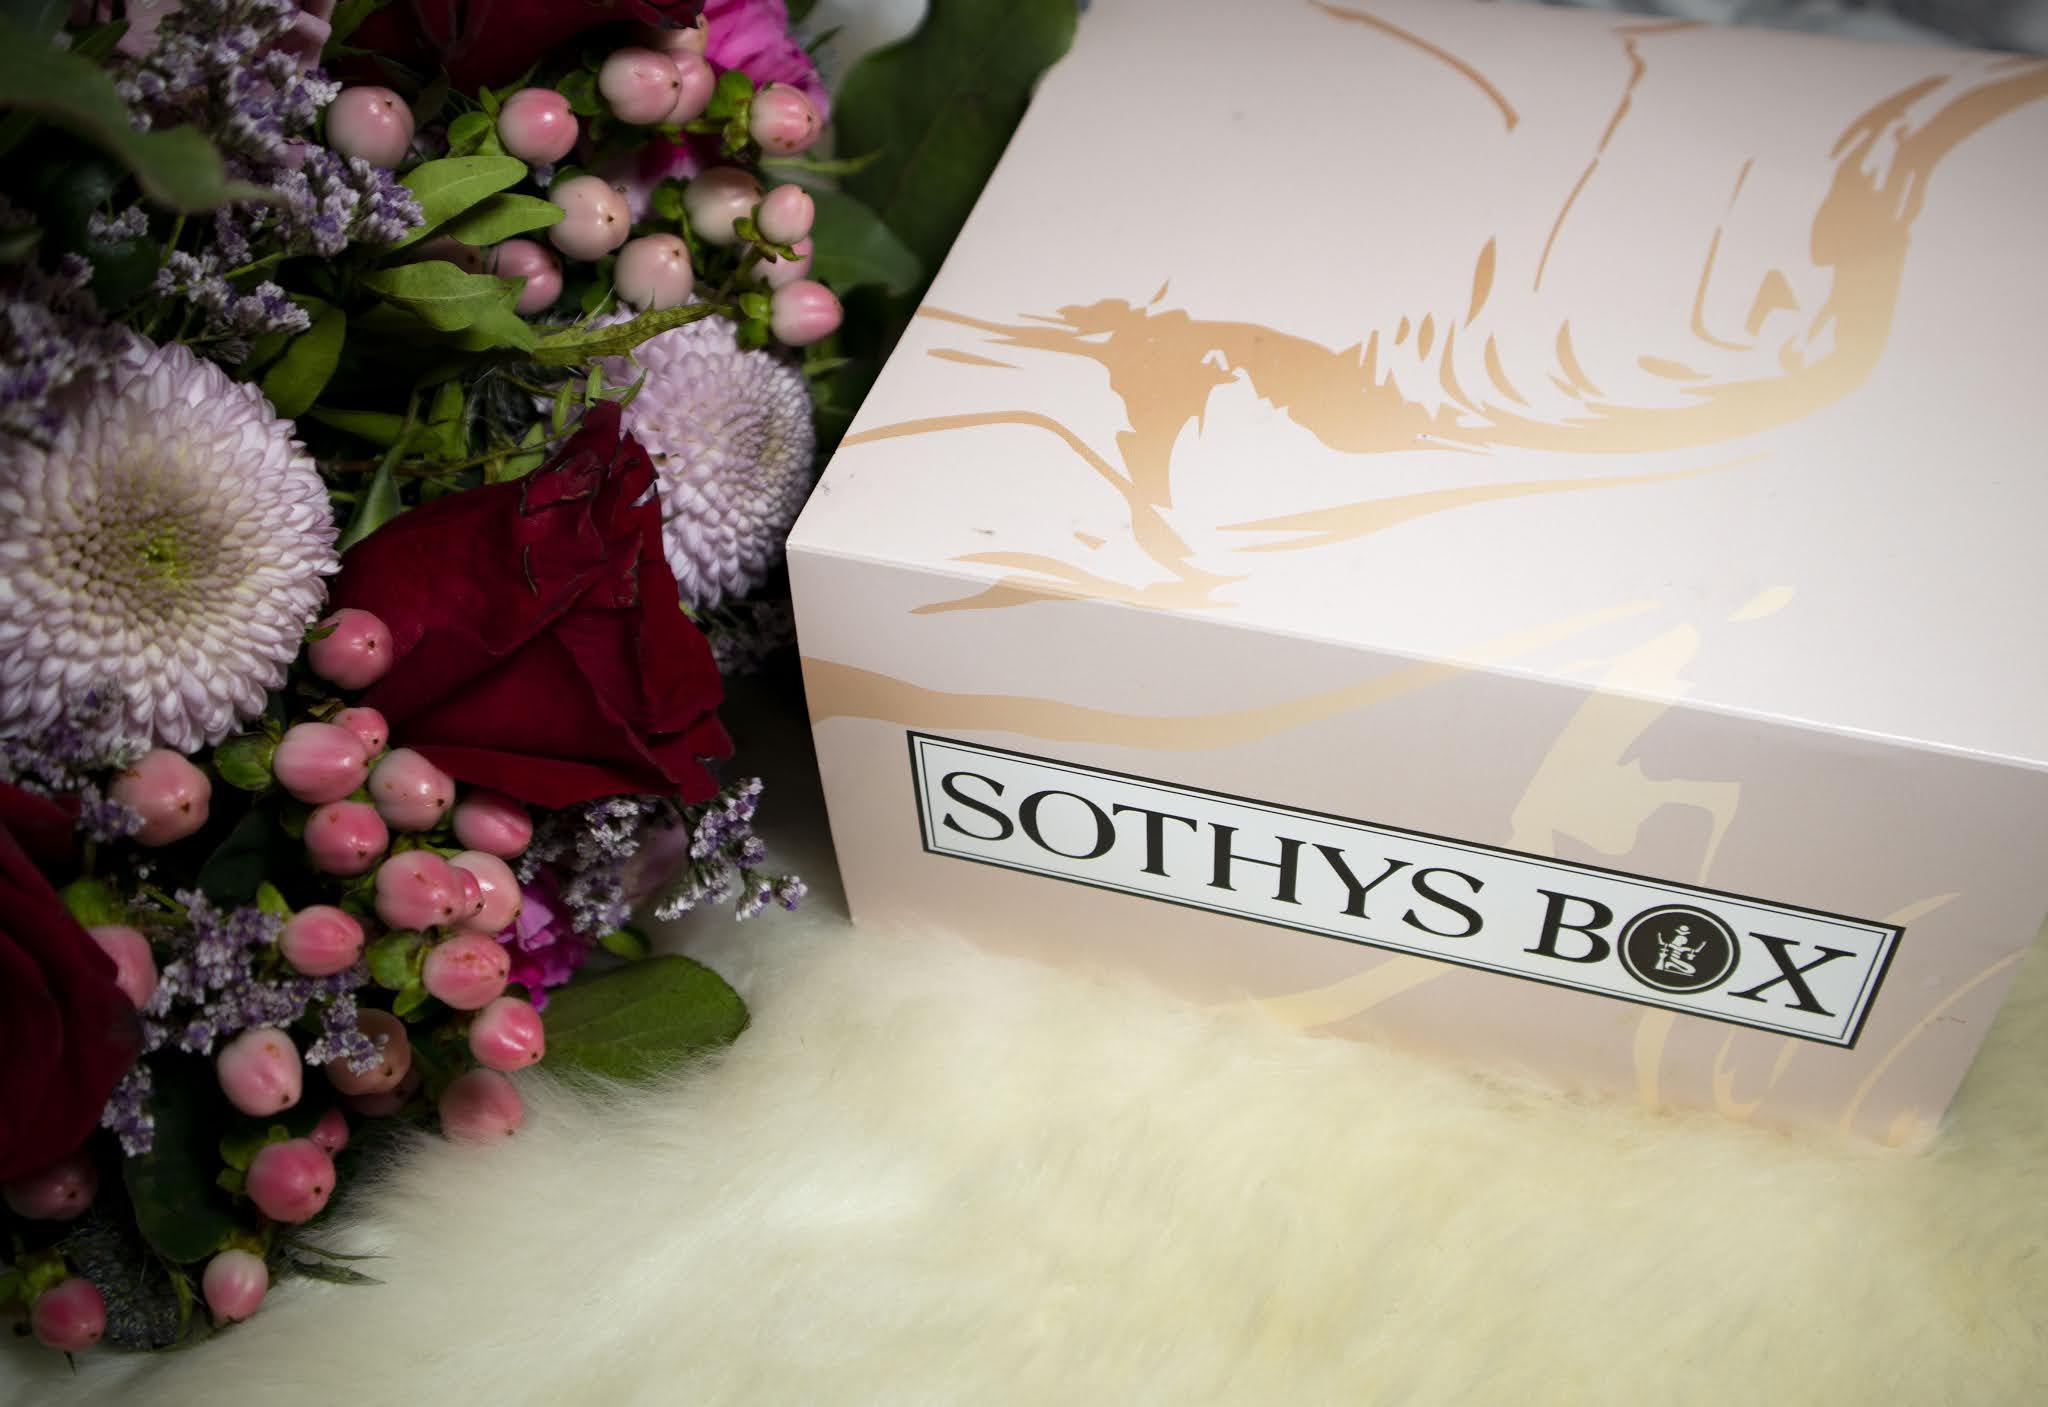 SOTHYS Box Frühjahrs-Edition 2021